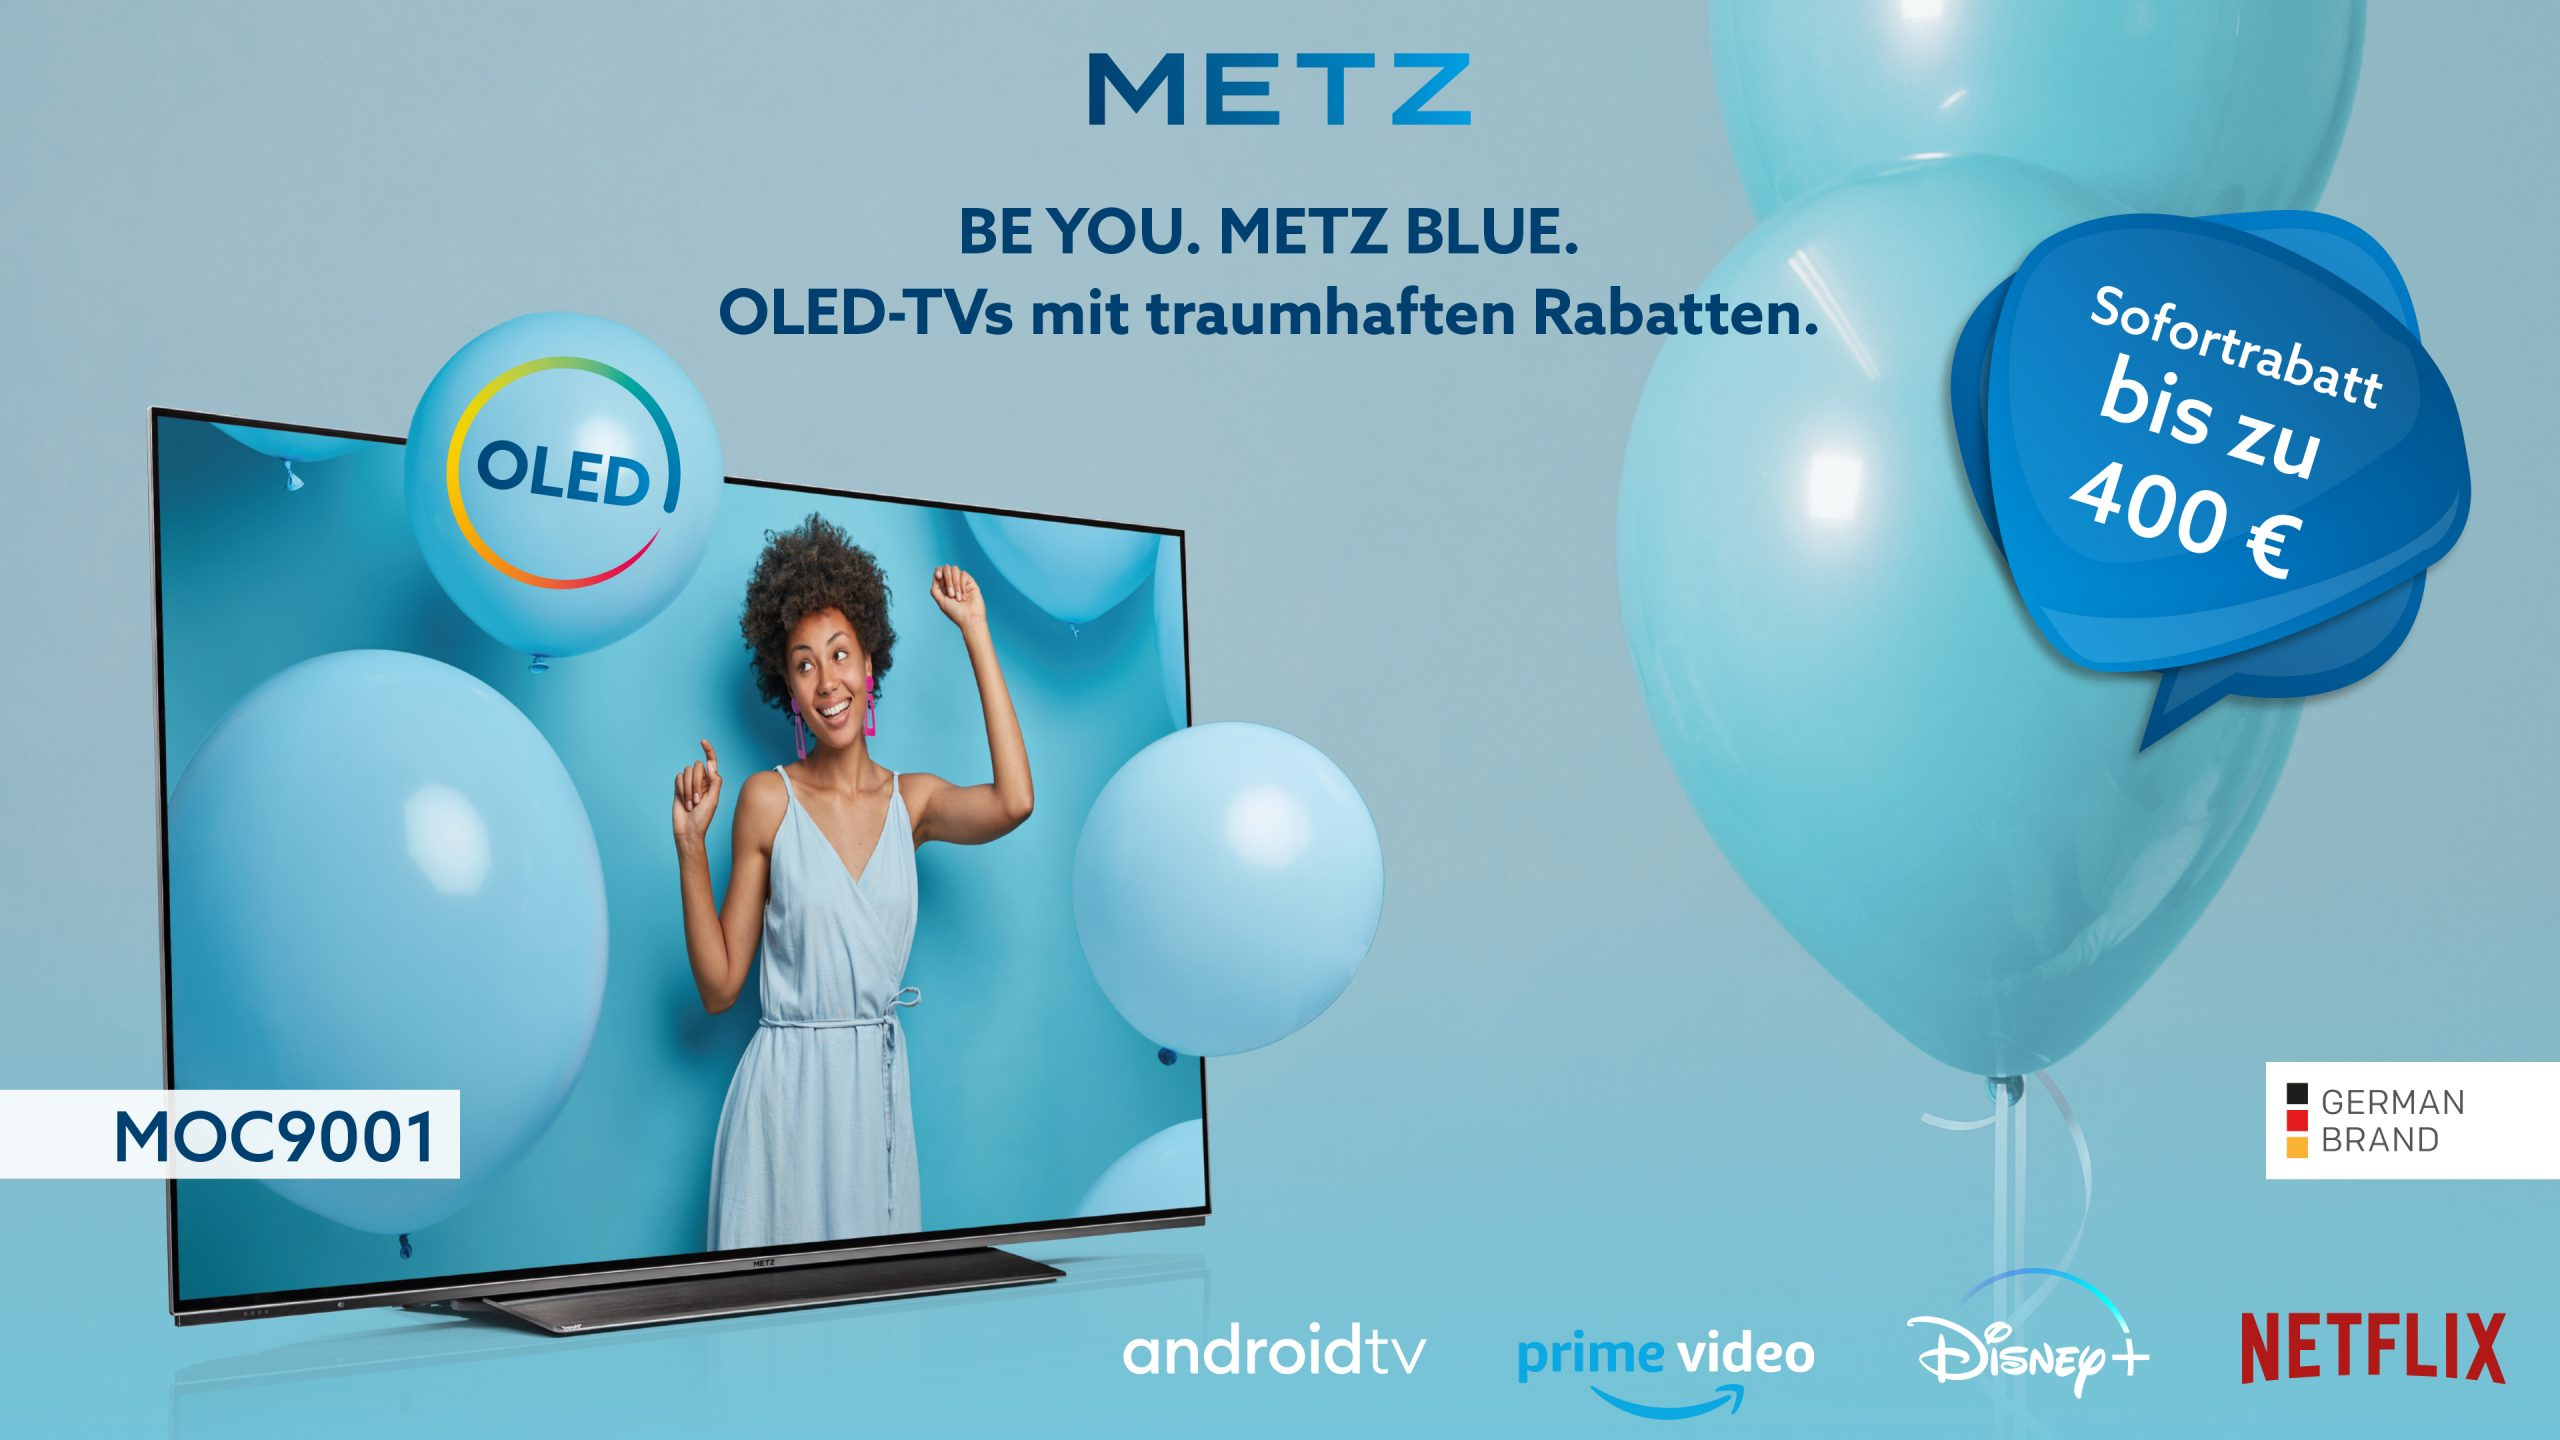 Metz blue MOC9001 Rabatt